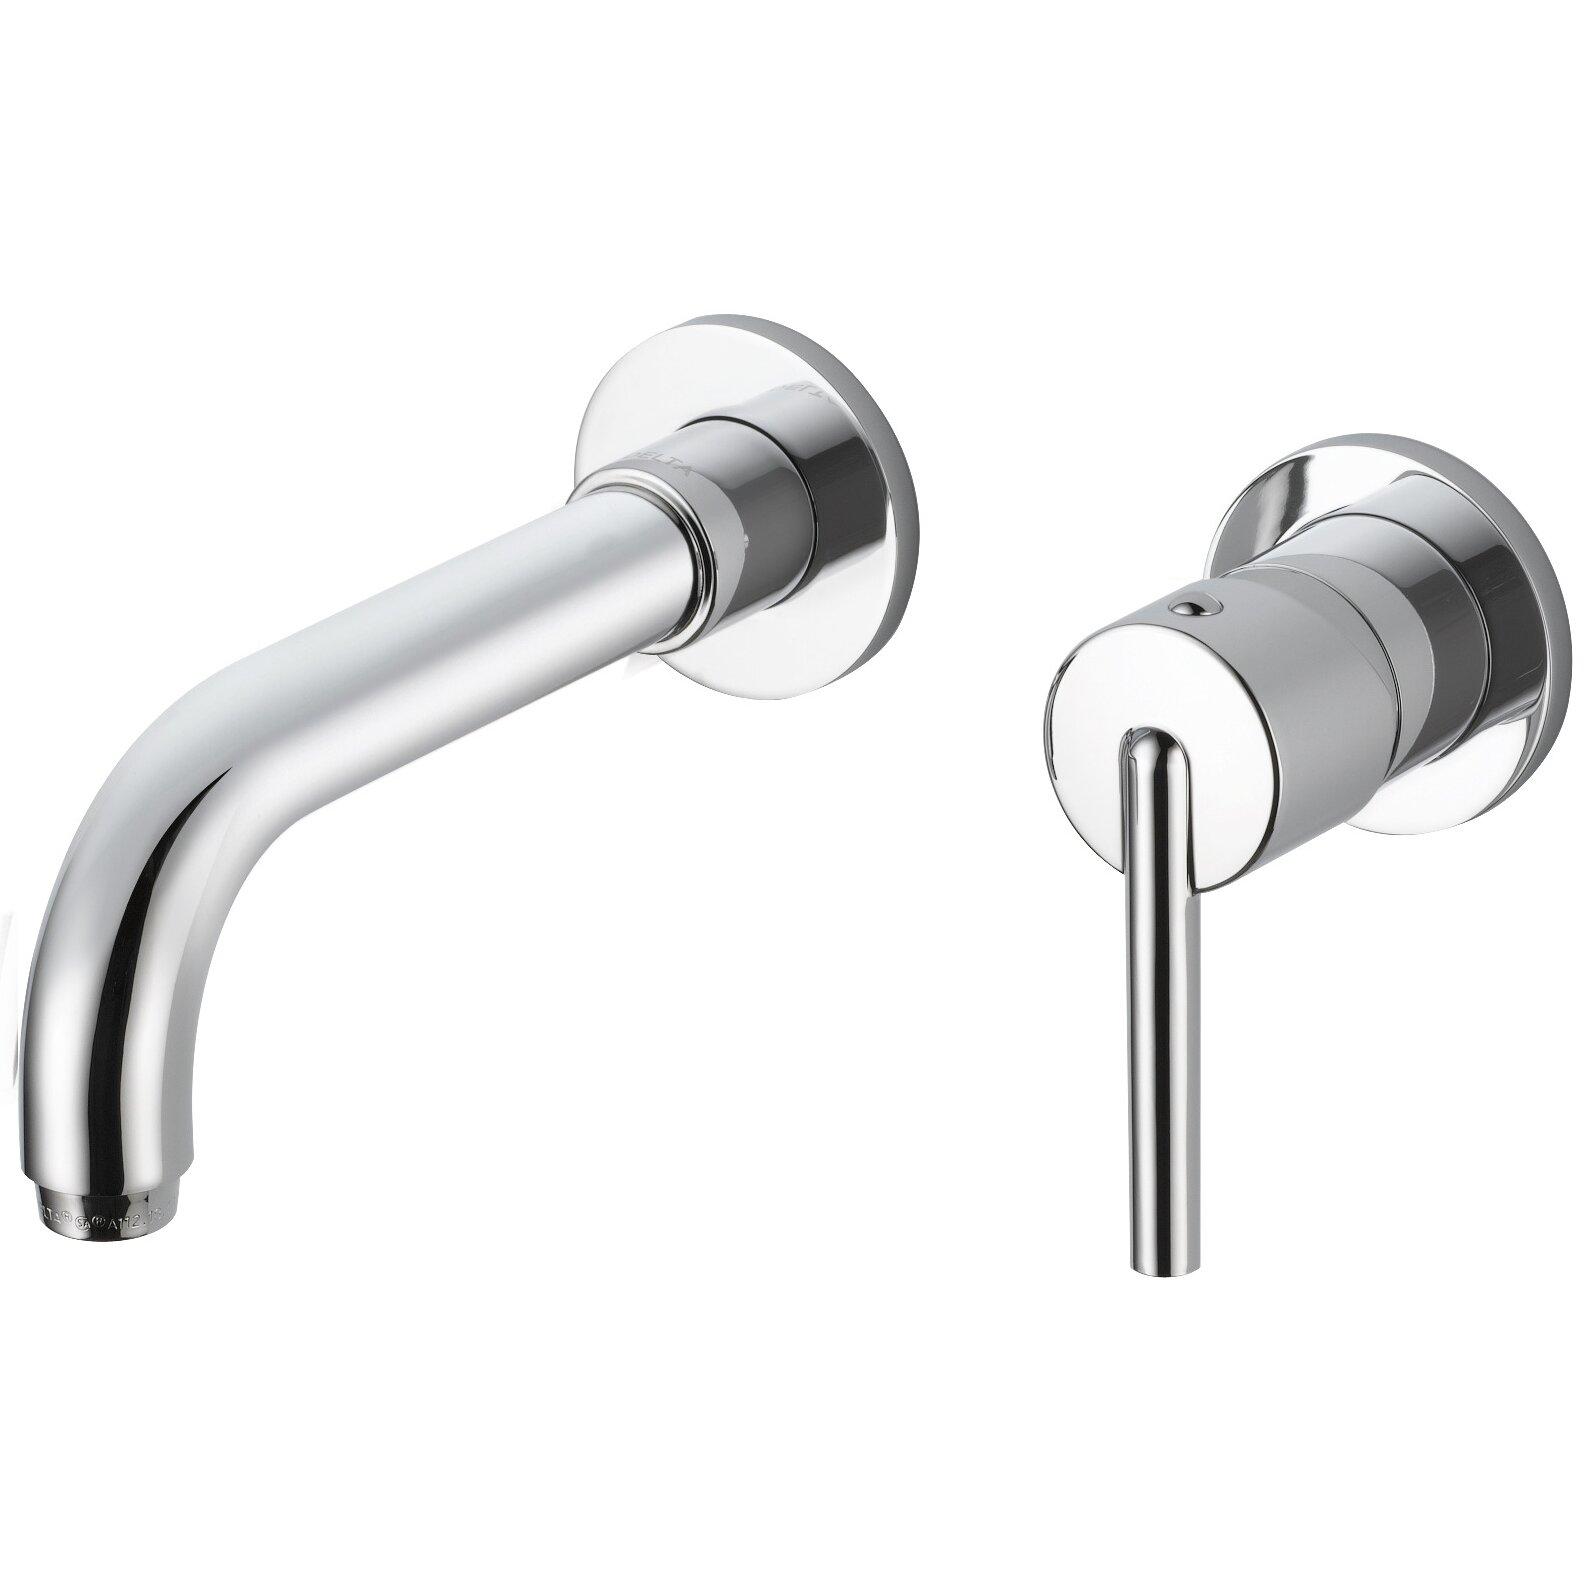 Cross Handle Bathroom Faucet Delta Trinsicr Bathroom Faucet Trim Single Handle Reviews Wayfair